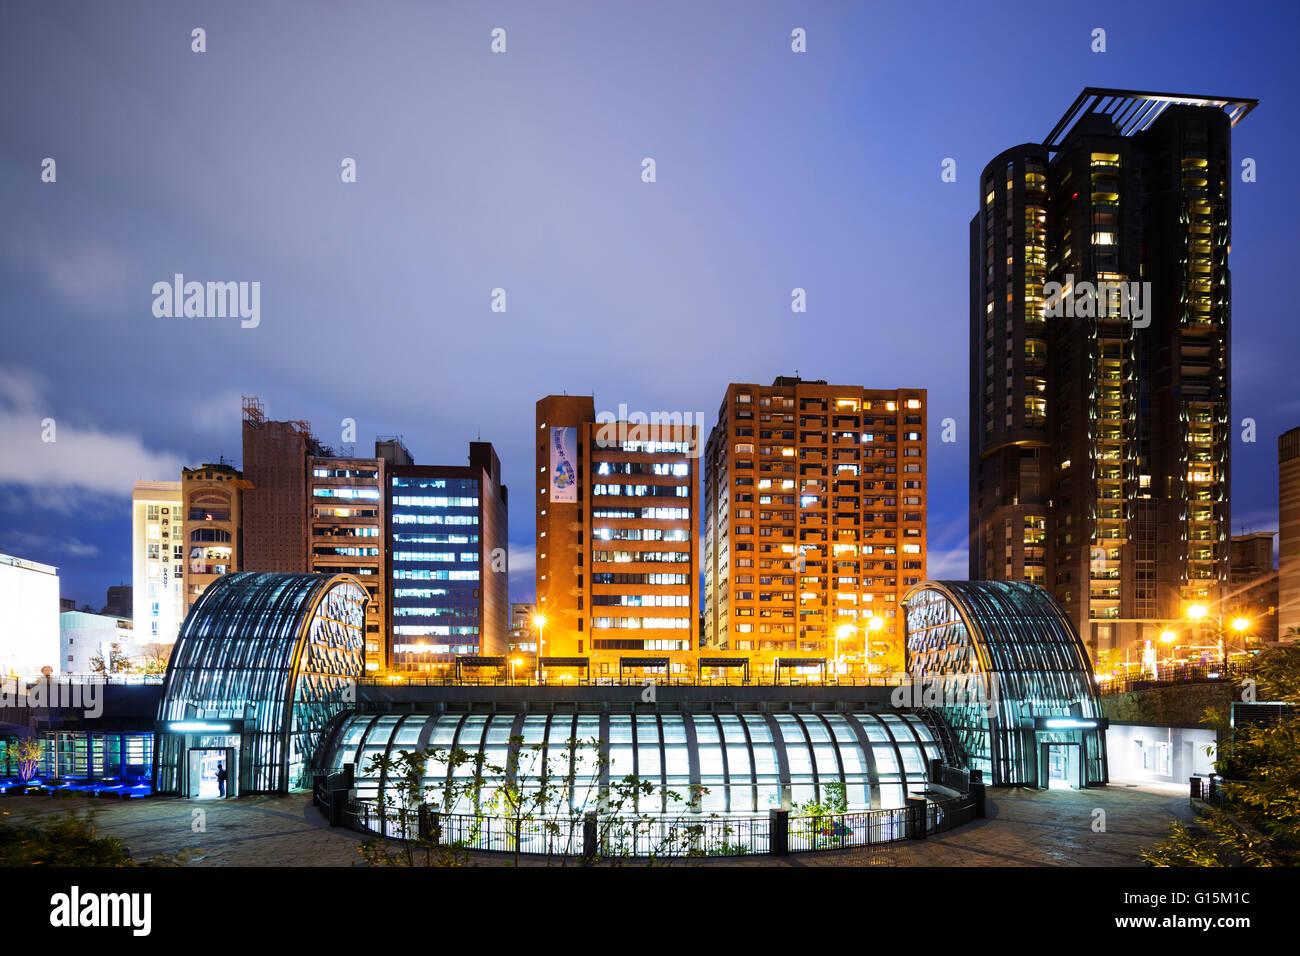 Daan Park subway station, Taipei, Taiwan, Asia - Stock Image